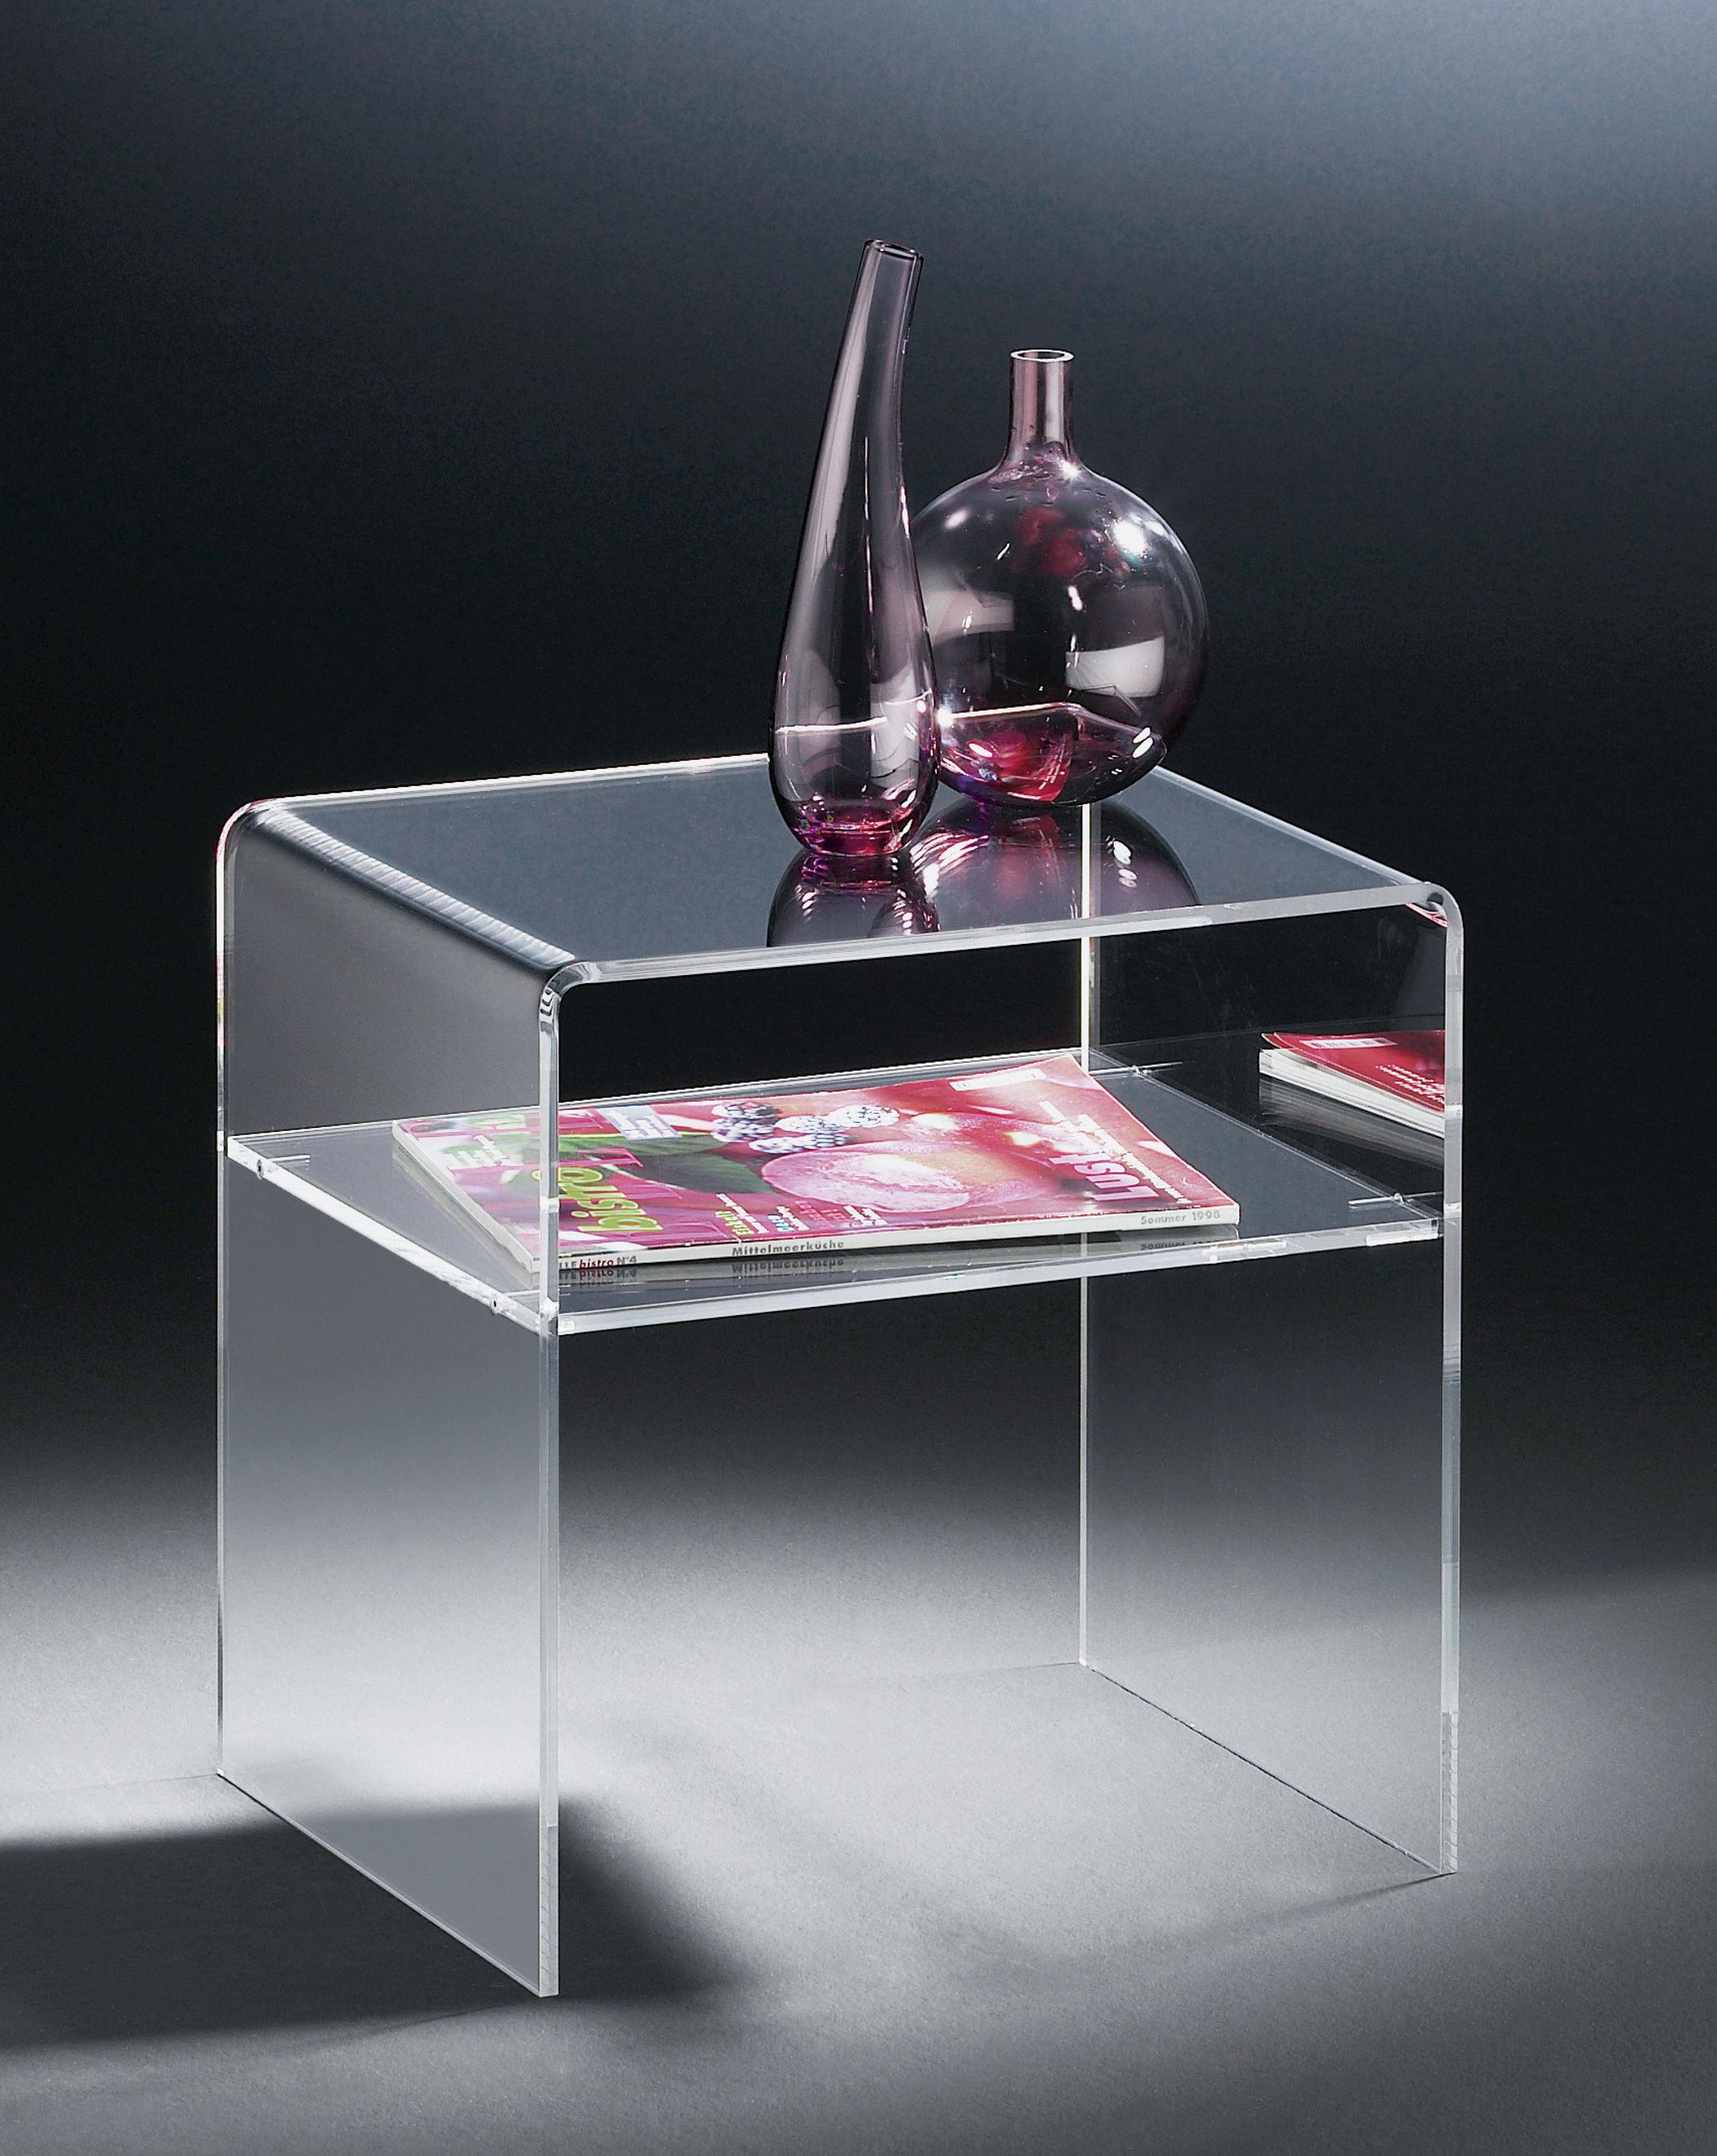 couchtische beistelltische beleuchteter tische howe. Black Bedroom Furniture Sets. Home Design Ideas